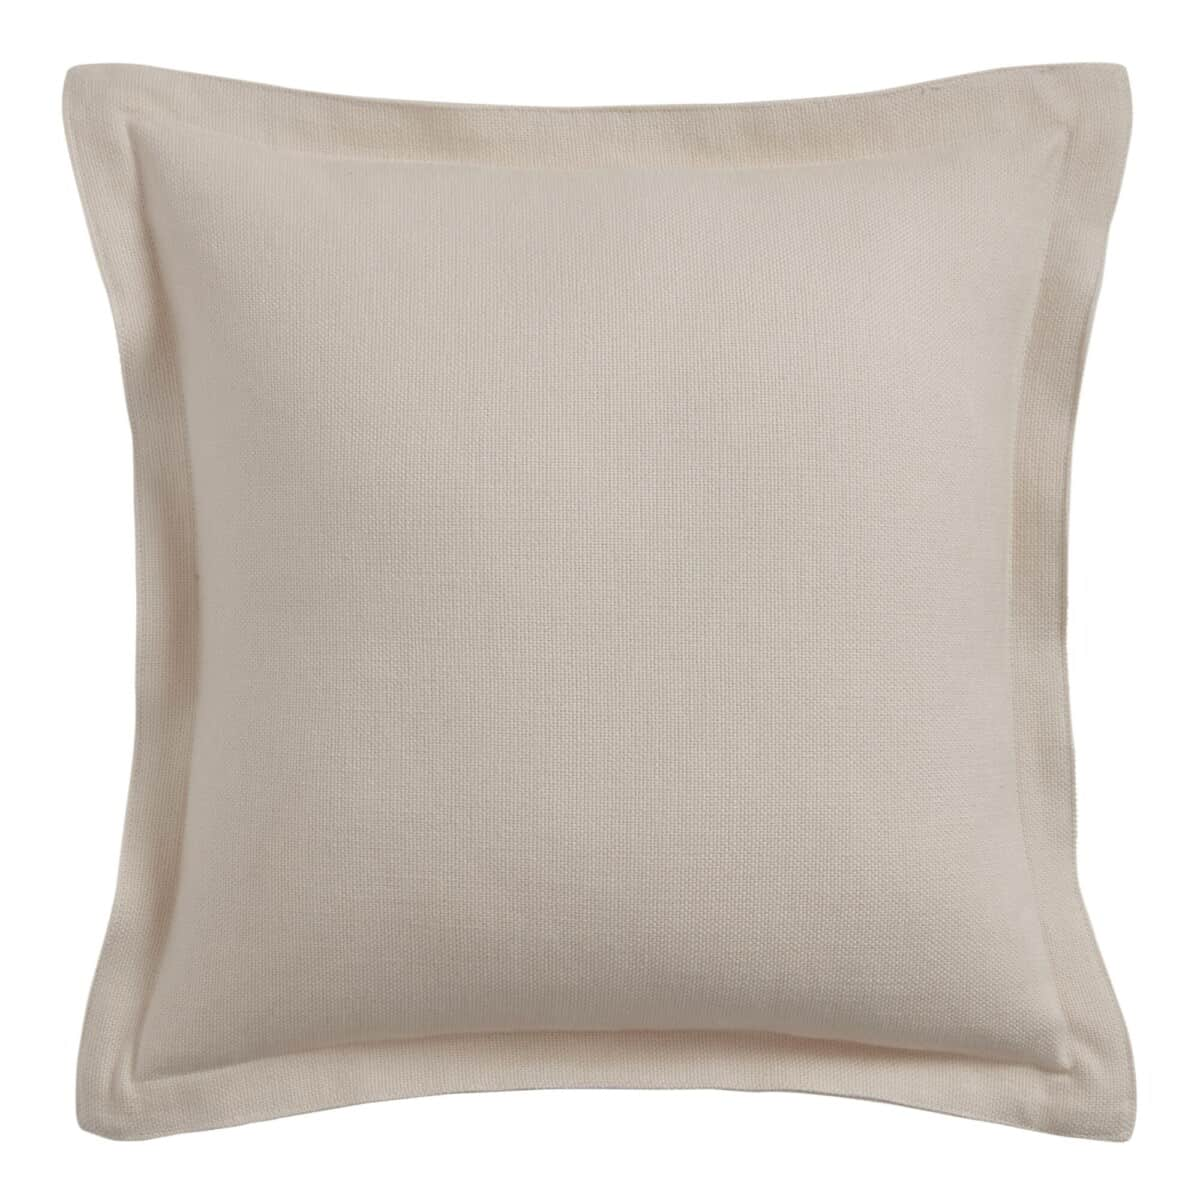 Woven Cotton Basket Weave Throw Pillow